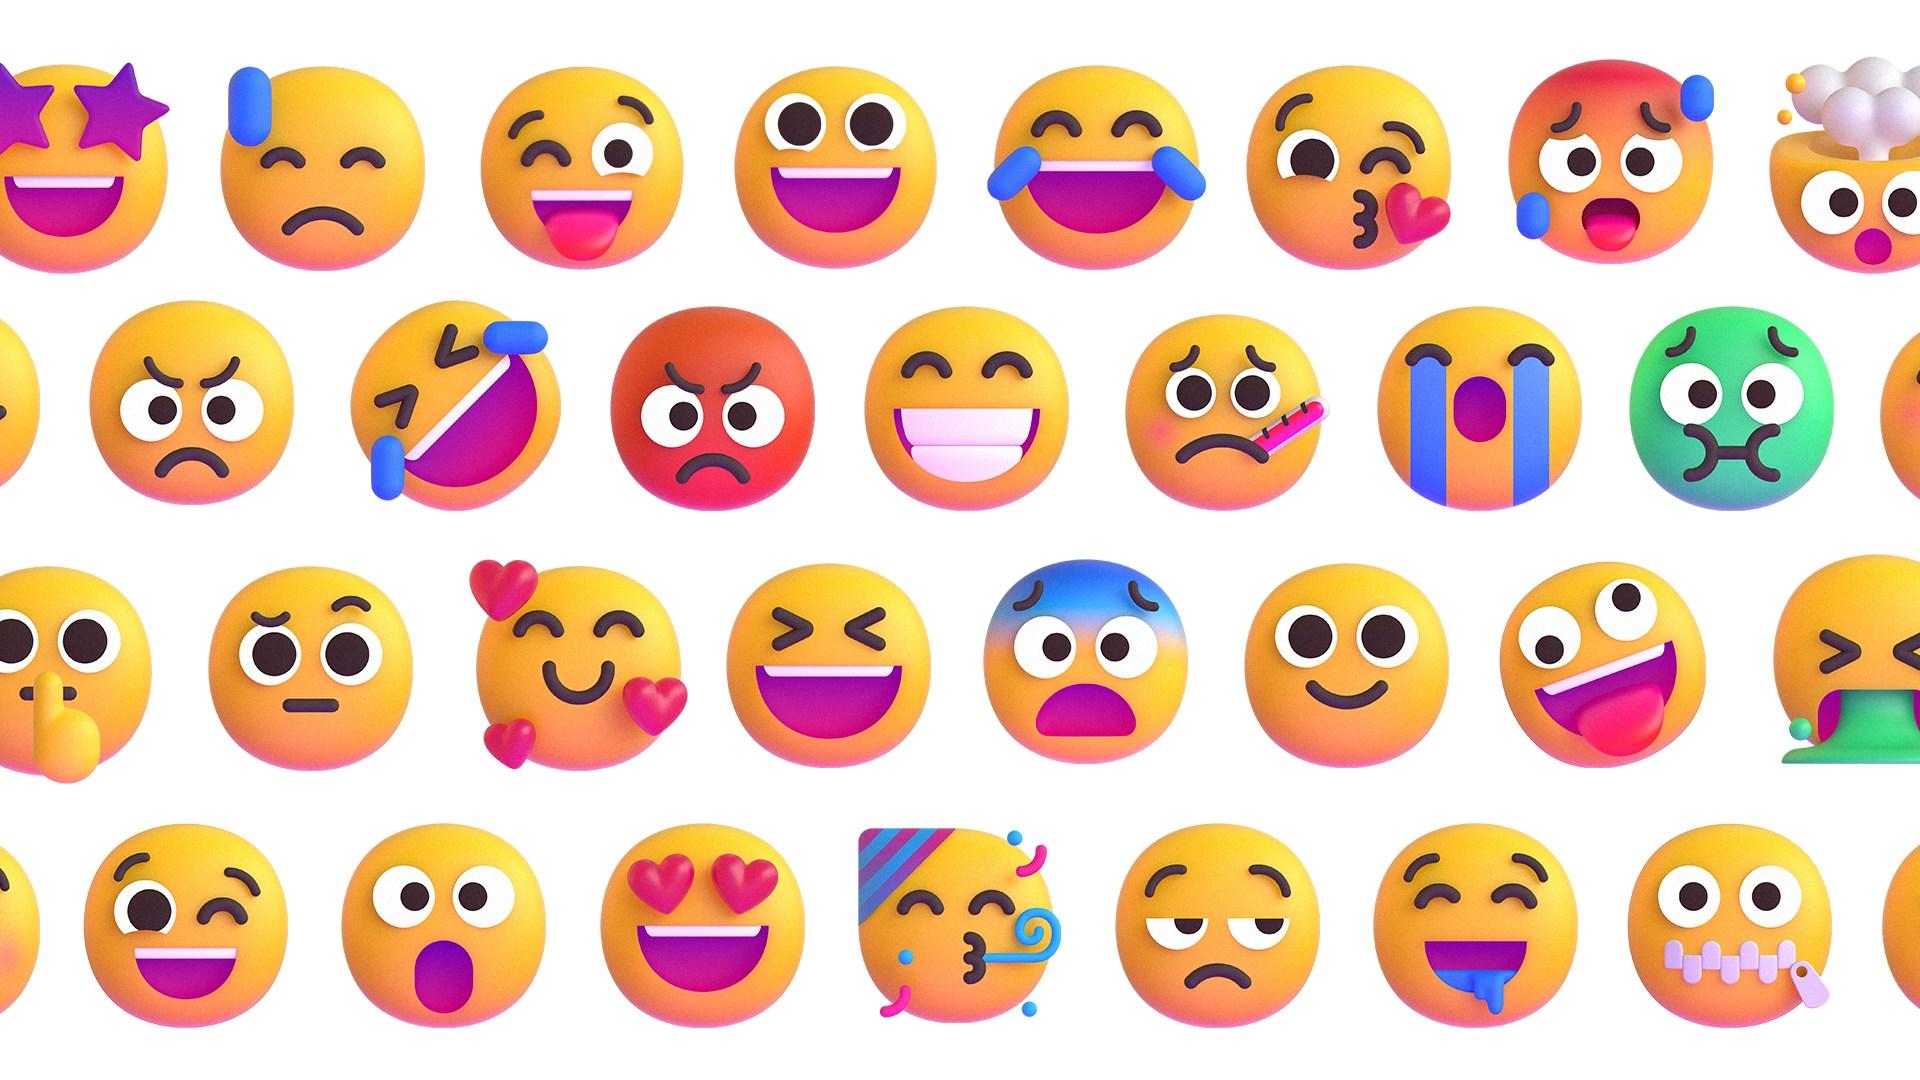 Microsoft, 3d, Emoji, Emojis, Smileys, 3D Emoji